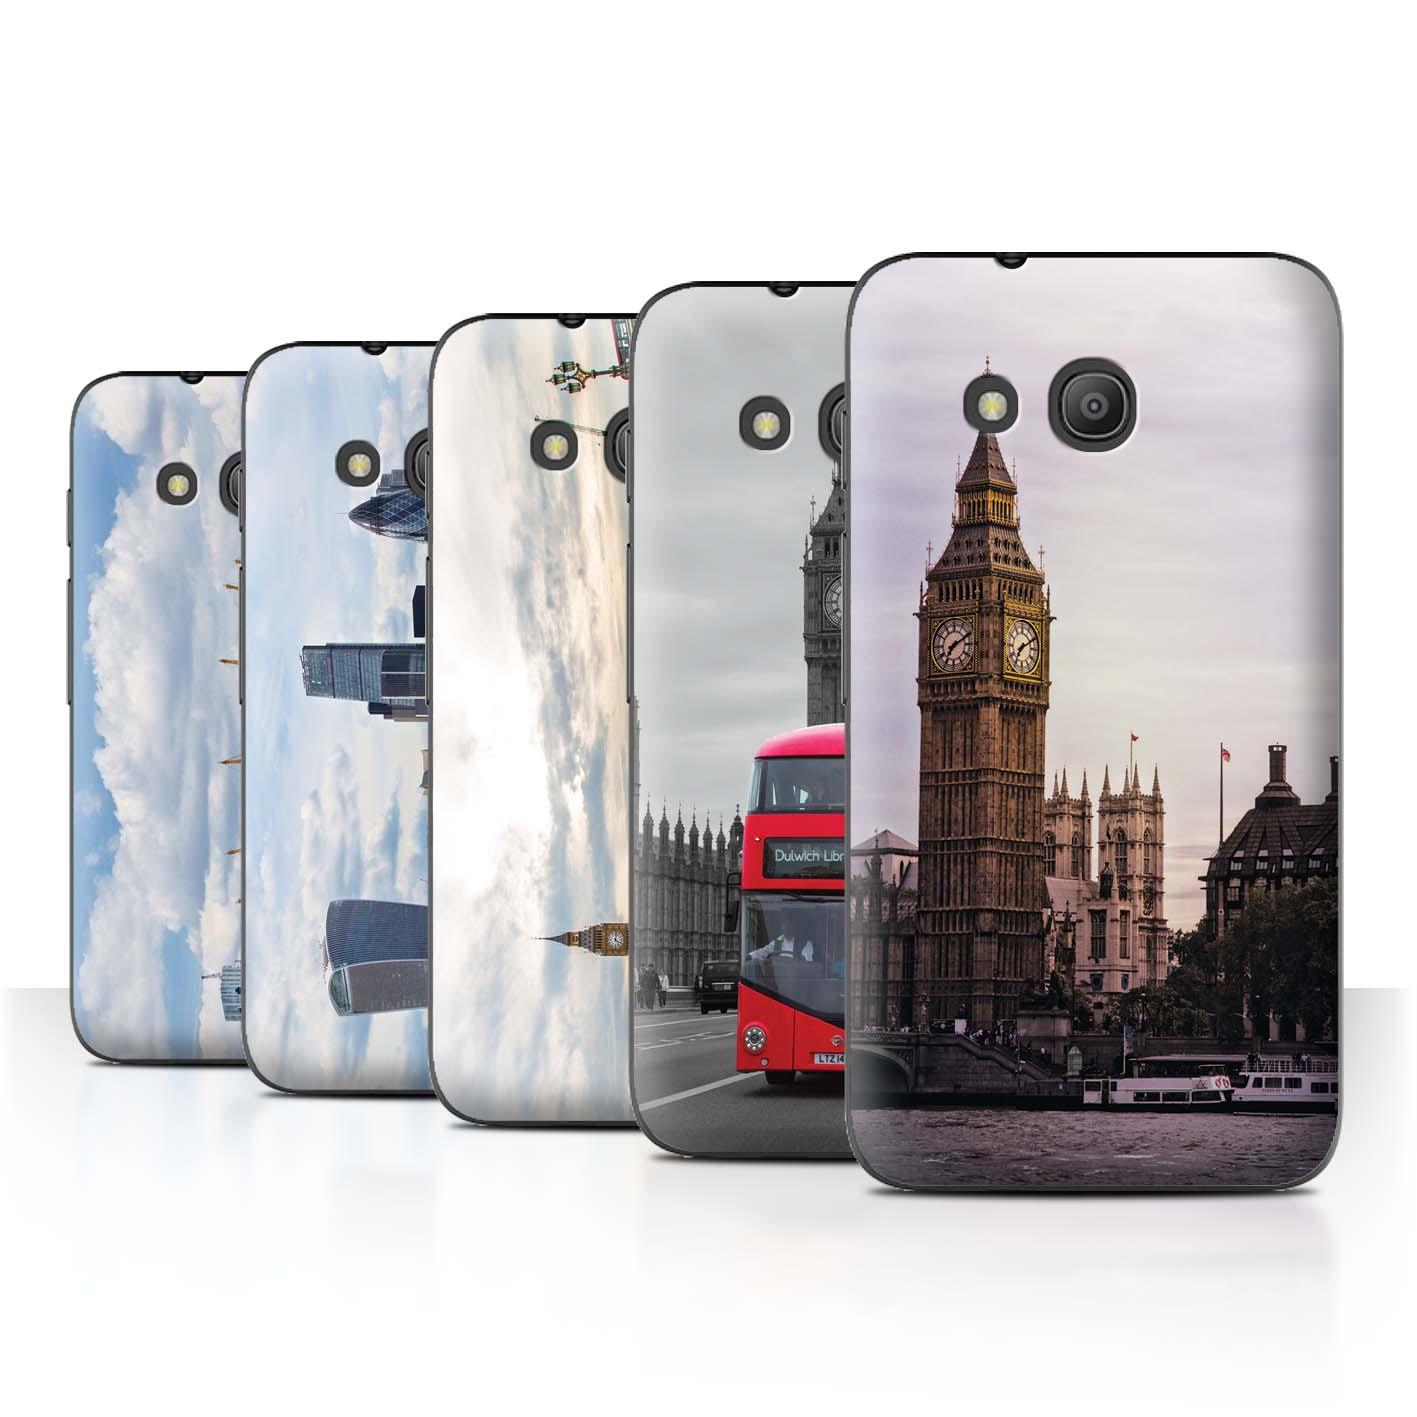 STUFF4-Back-Case-Cover-Skin-for-Alcatel-Pixi-4-4-034-London-Sites